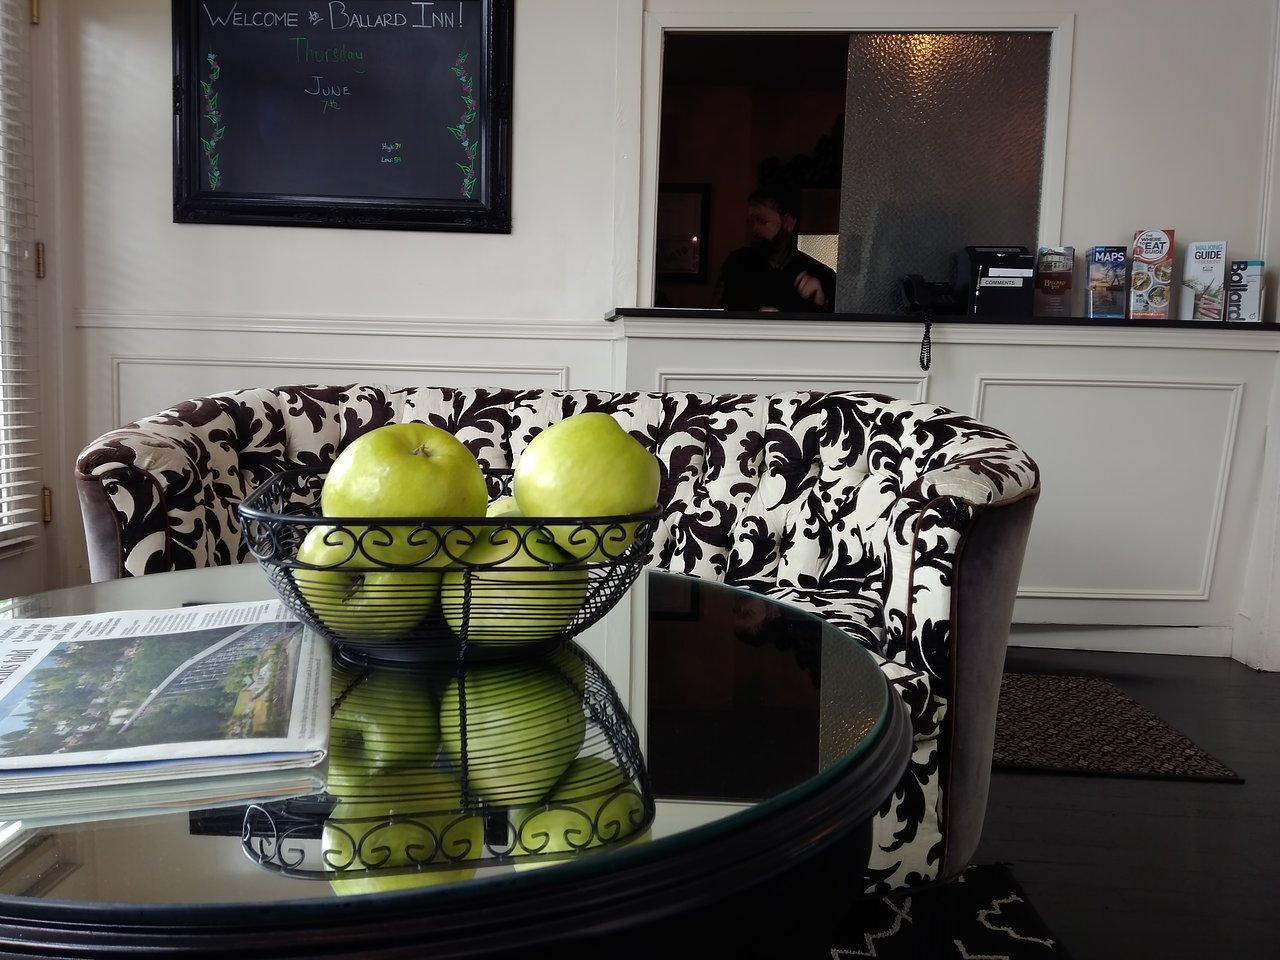 ballard inn $110 ($̶1̶5̶9̶) - prices & hotel reviews - seattle, wa